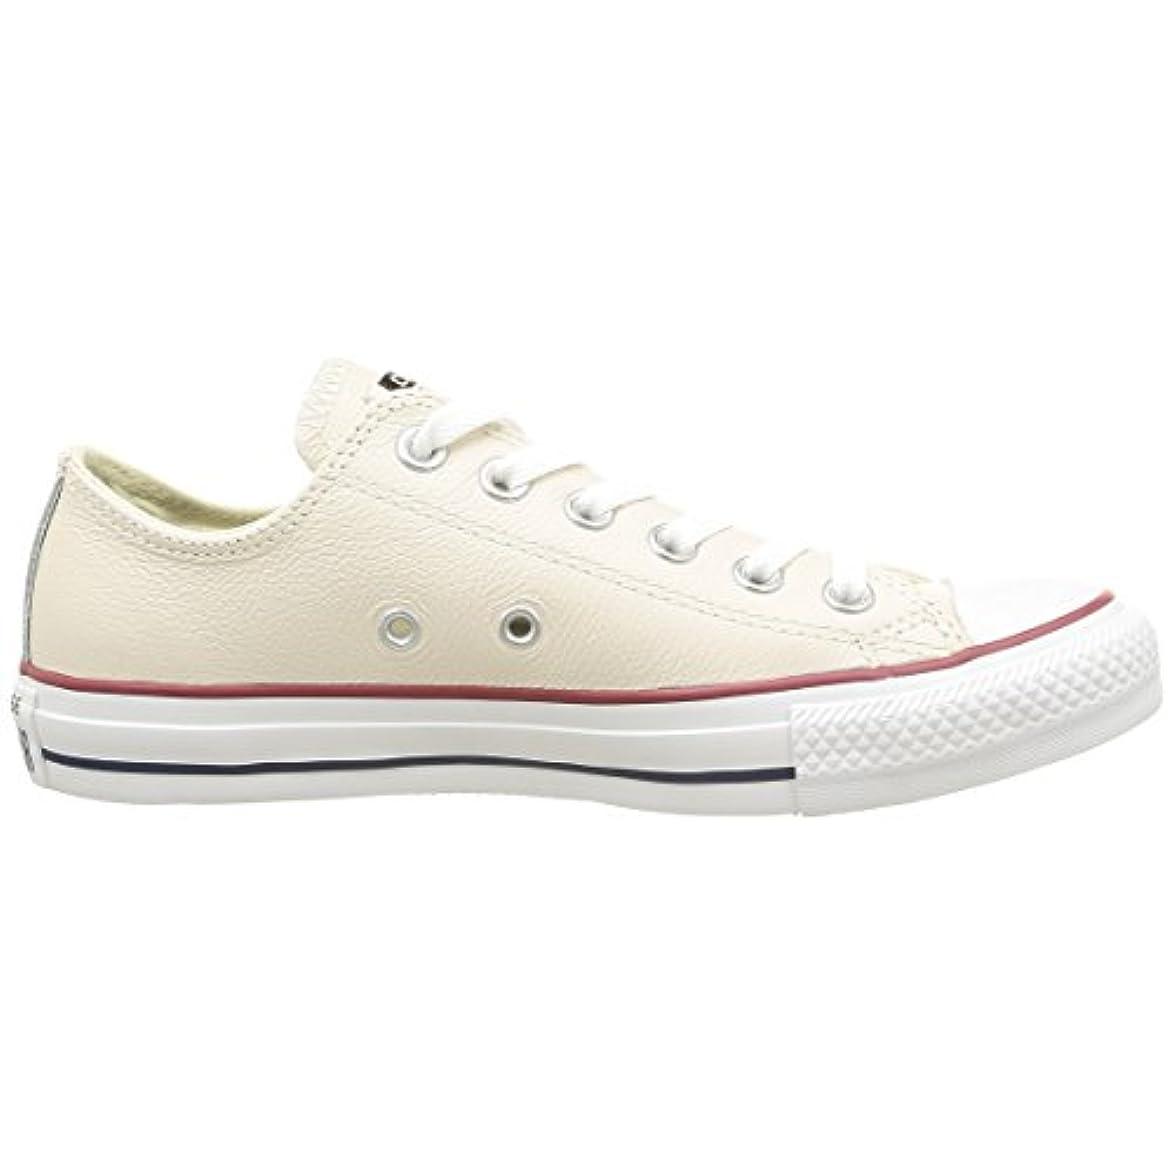 Converse - Ctas Sea Lea Ox Sneakers Da Donna